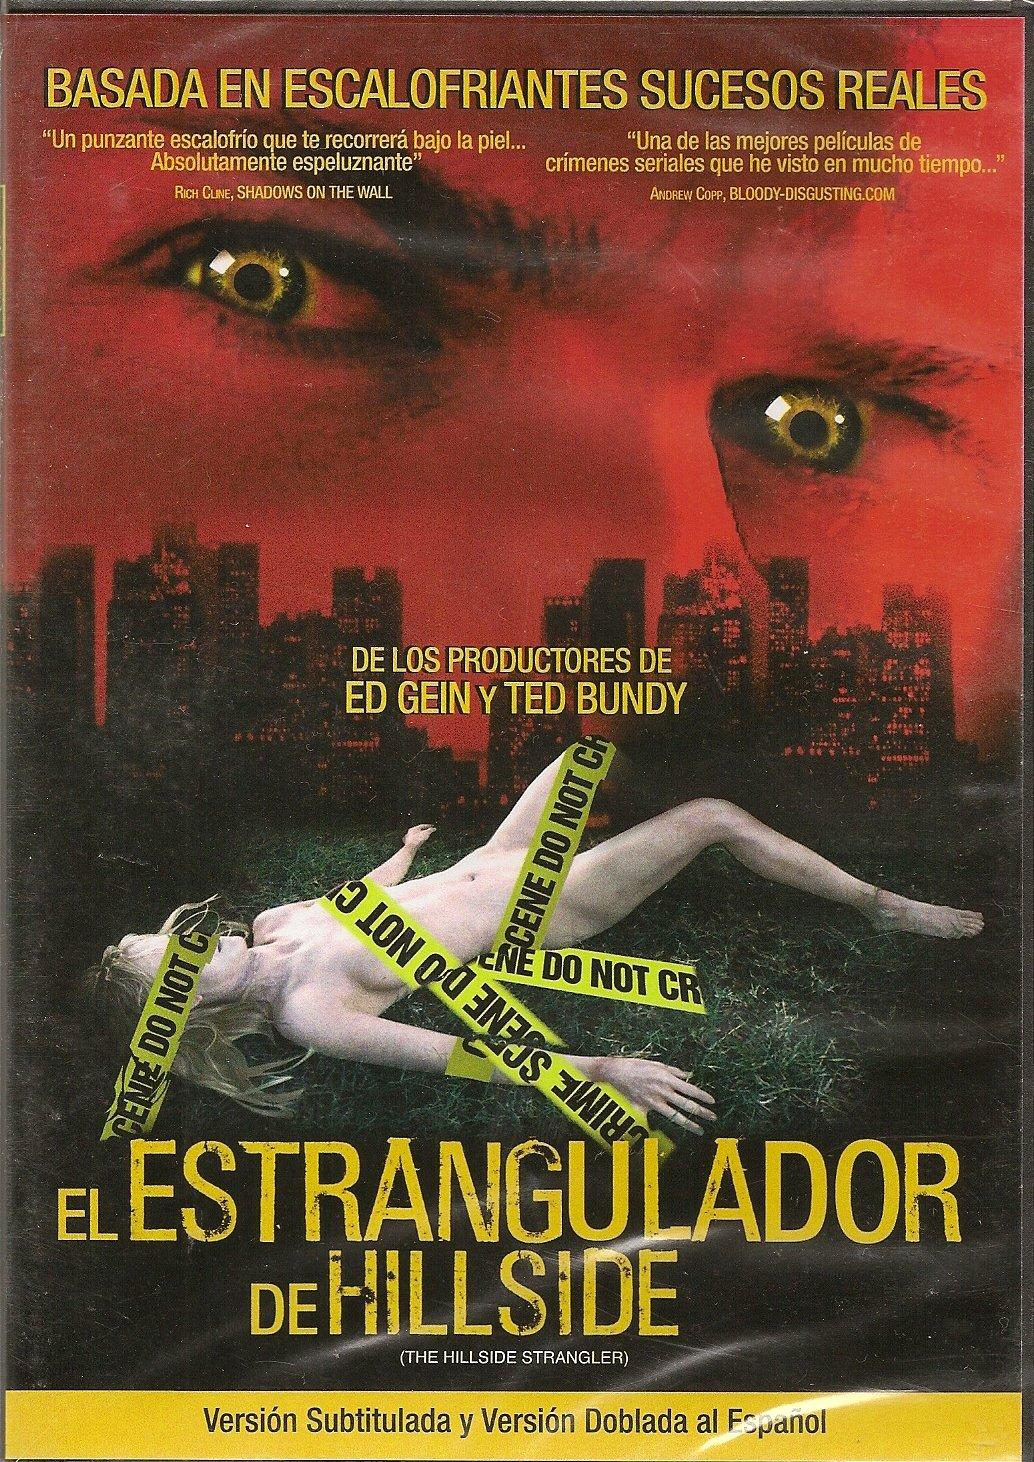 rampage the hillside strangler murders subtitles